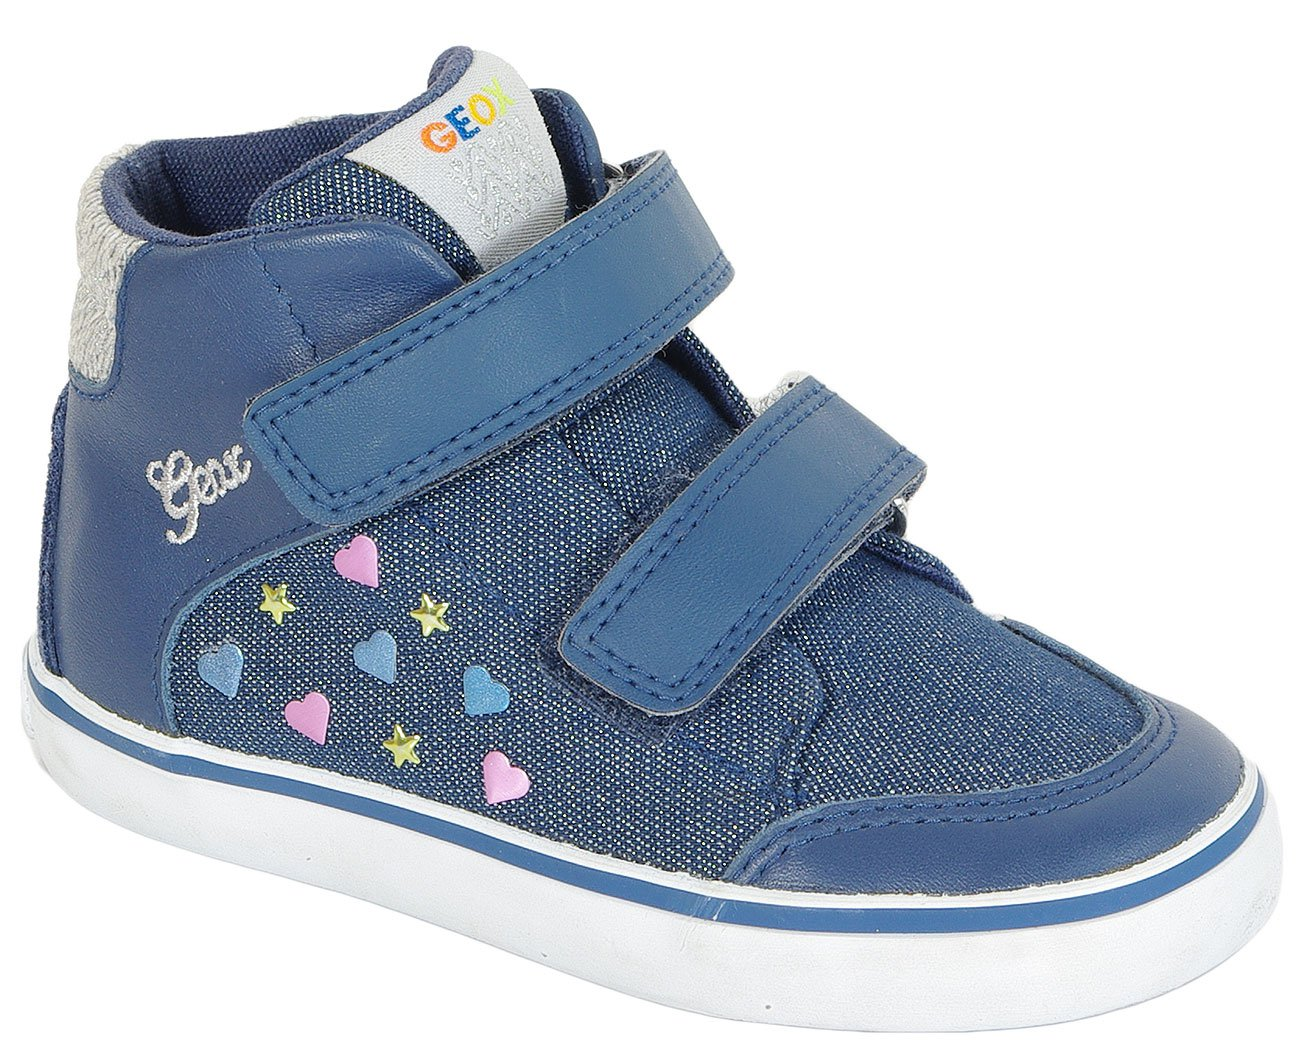 GEOX Kiwi A sneakers Shi Denim+Nappa Navy